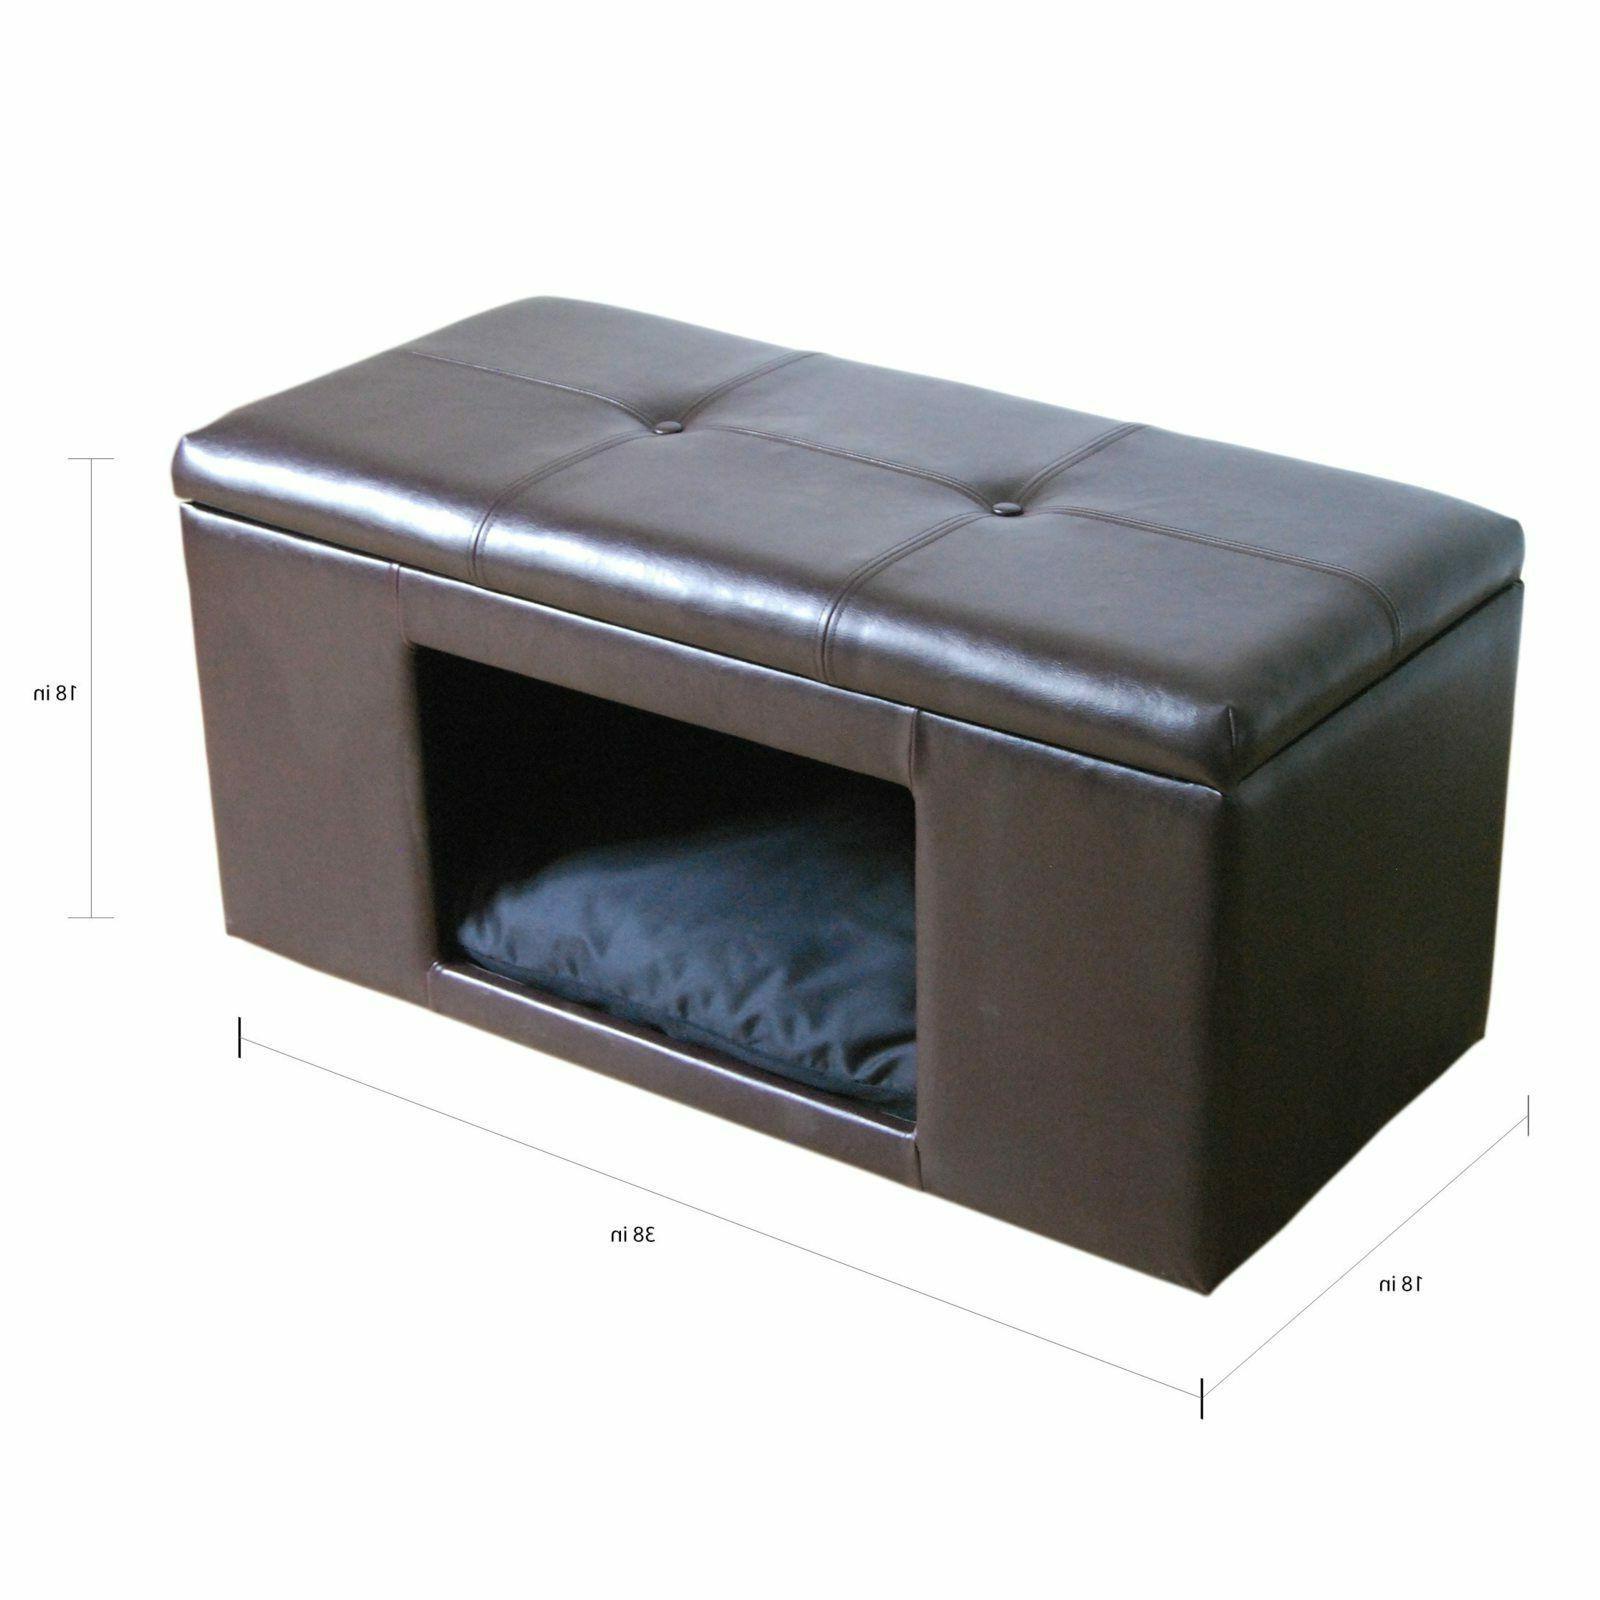 Pet of furniture